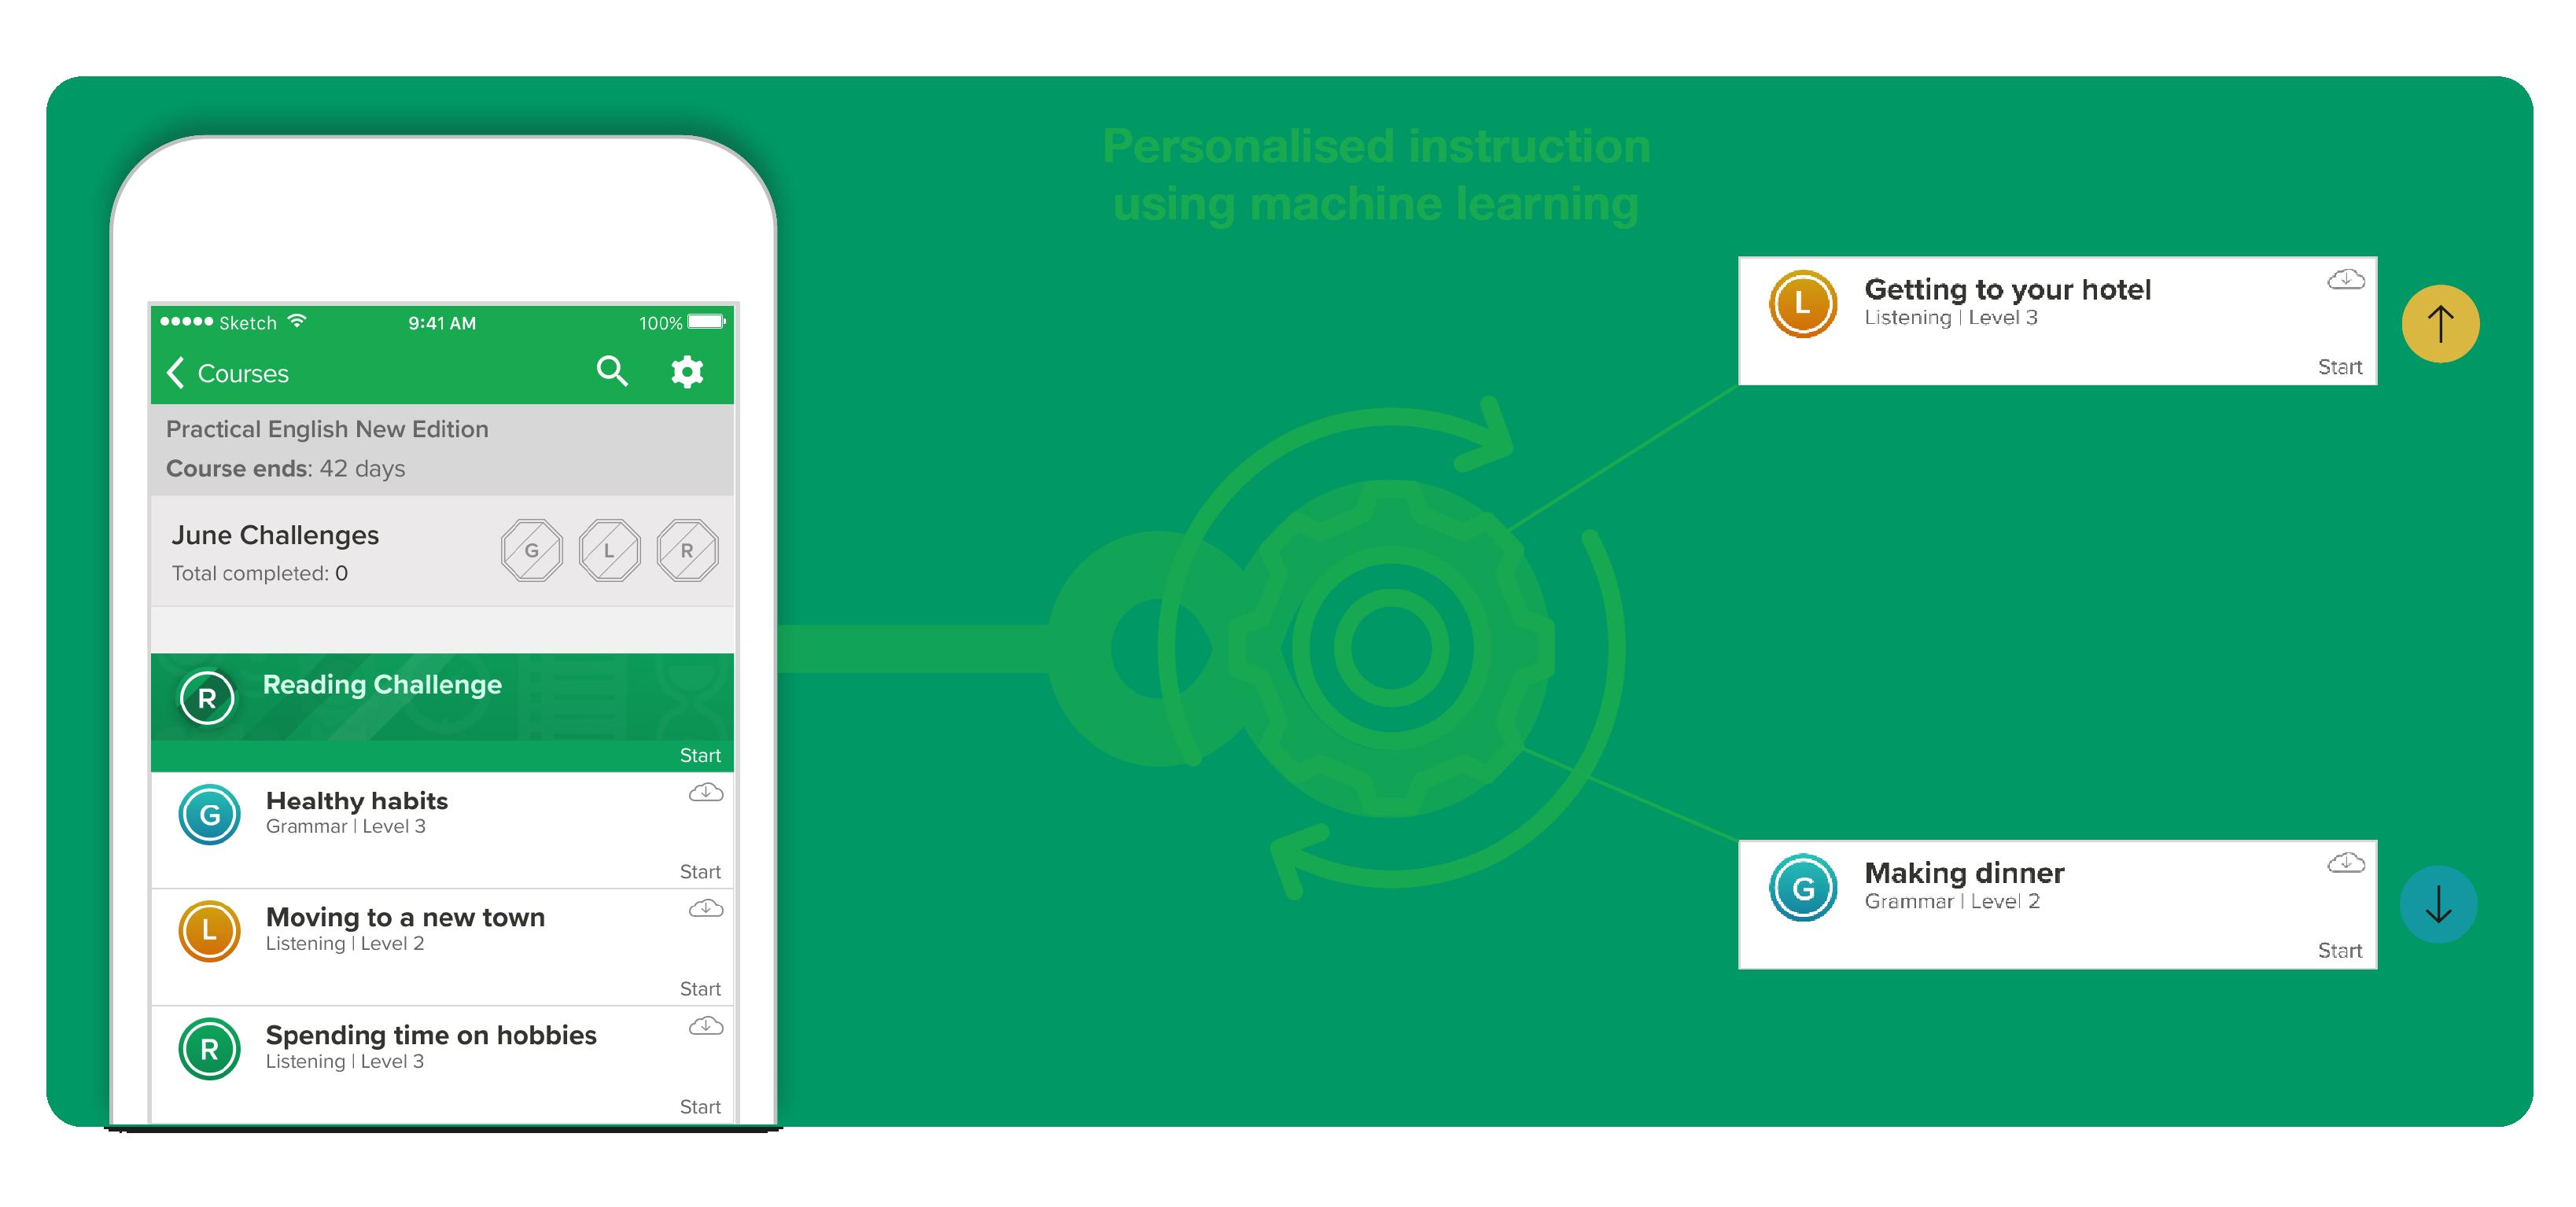 Personalised instruction using machine learning